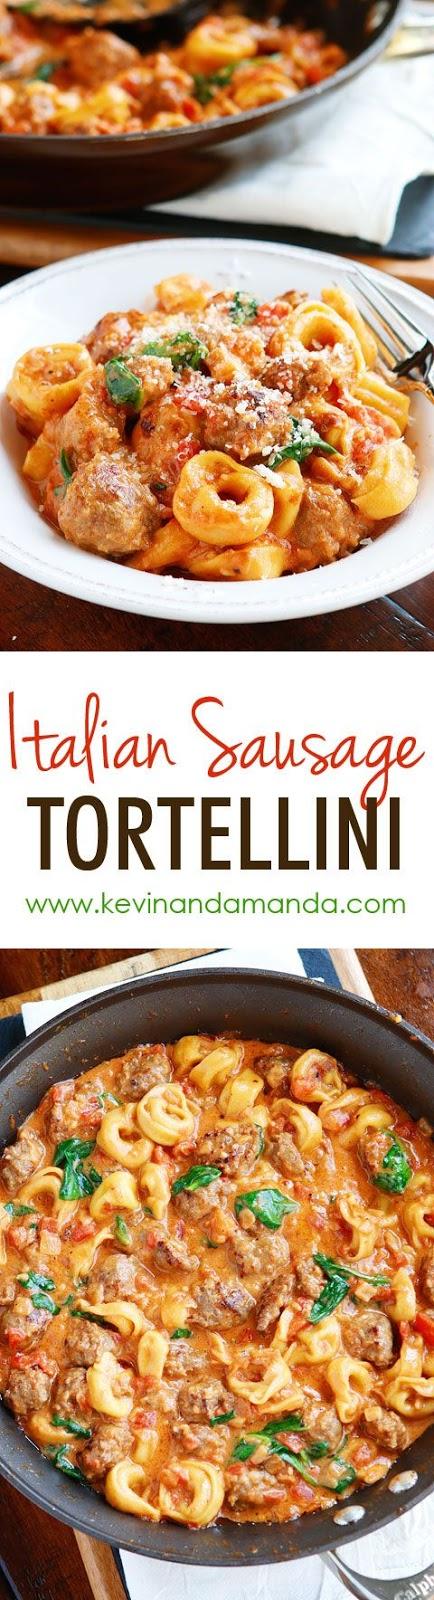 ITALIAN SAUSAGE TORTELLINI